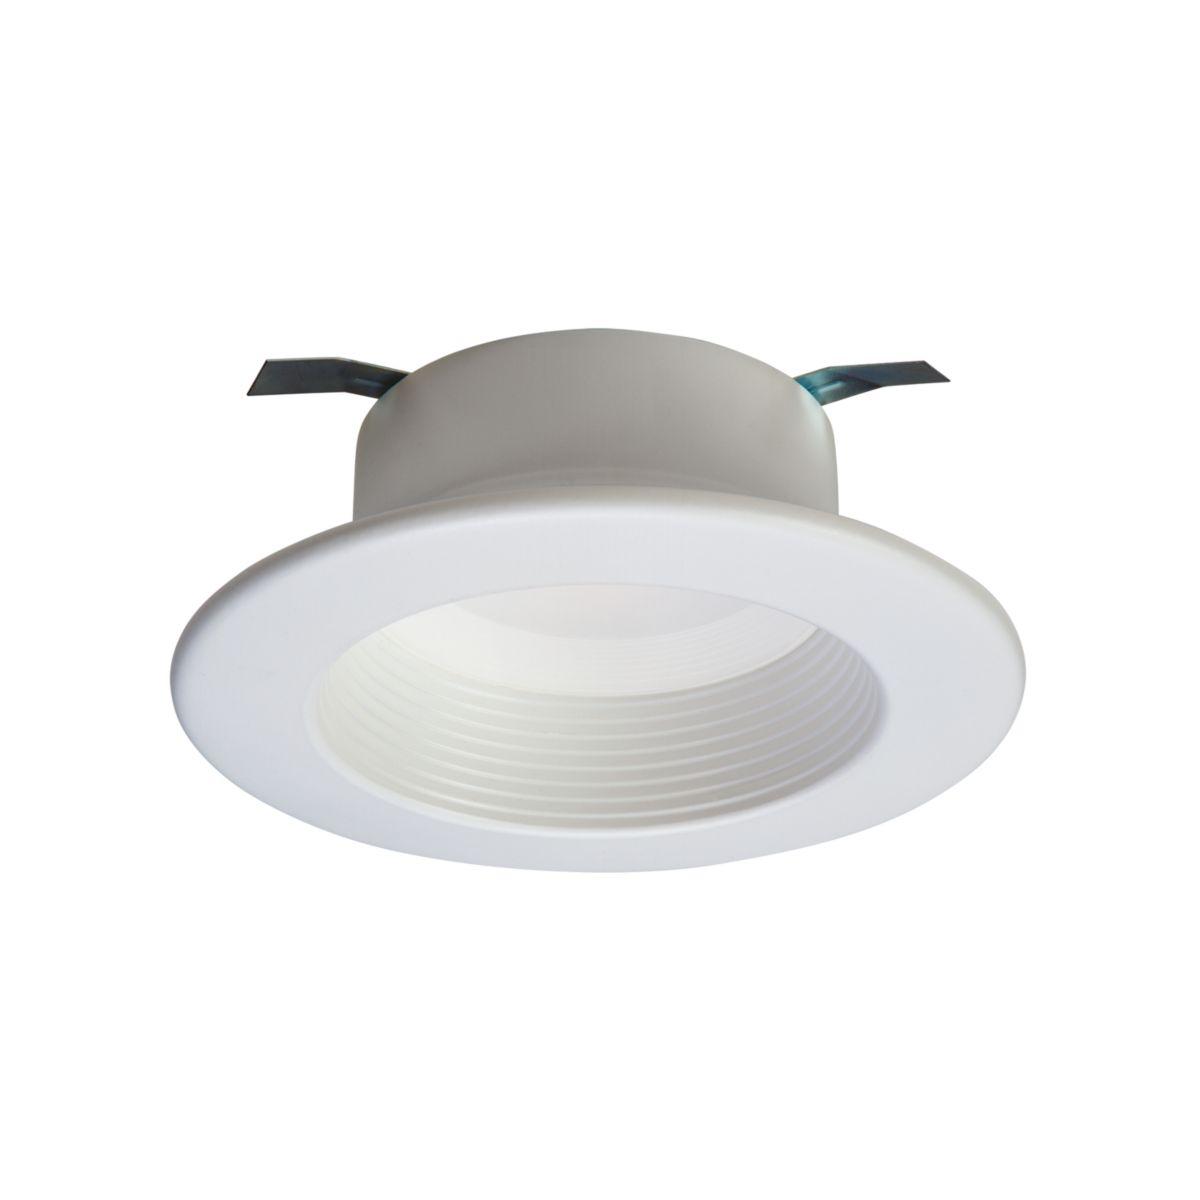 RL4 All-Purpose LED Baffle-trim Modules